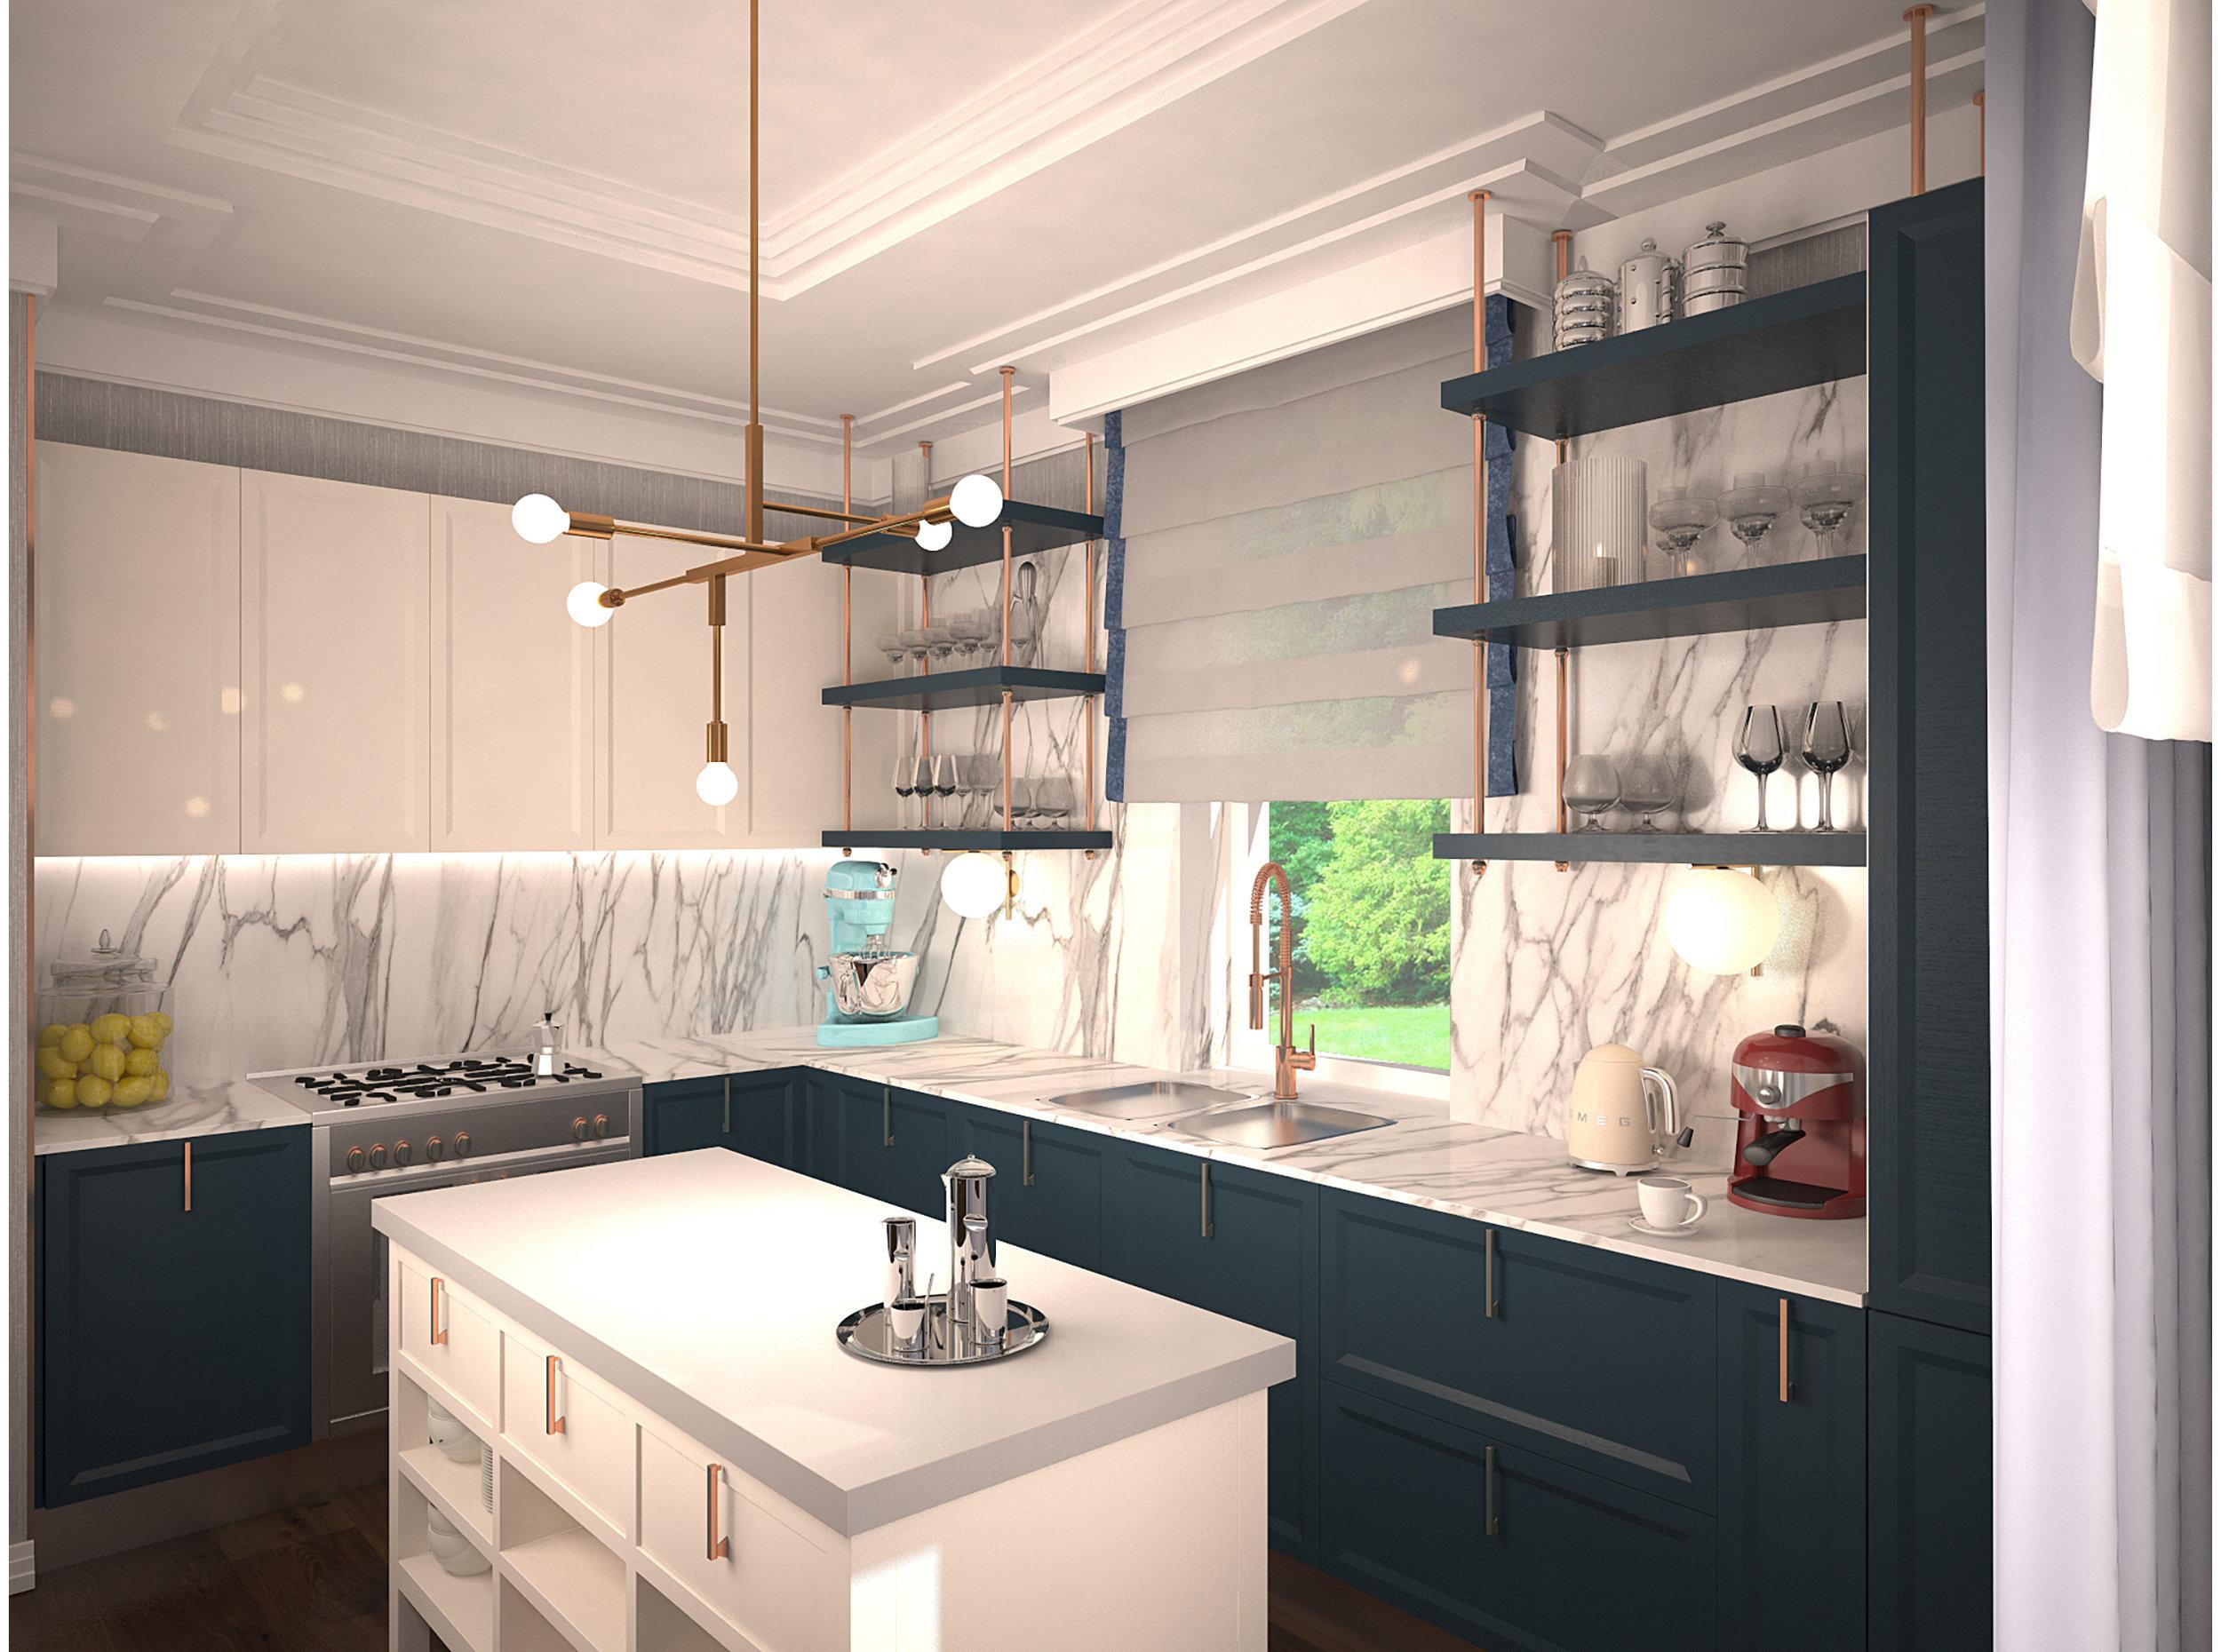 Copy of Art deco style kitchen interior